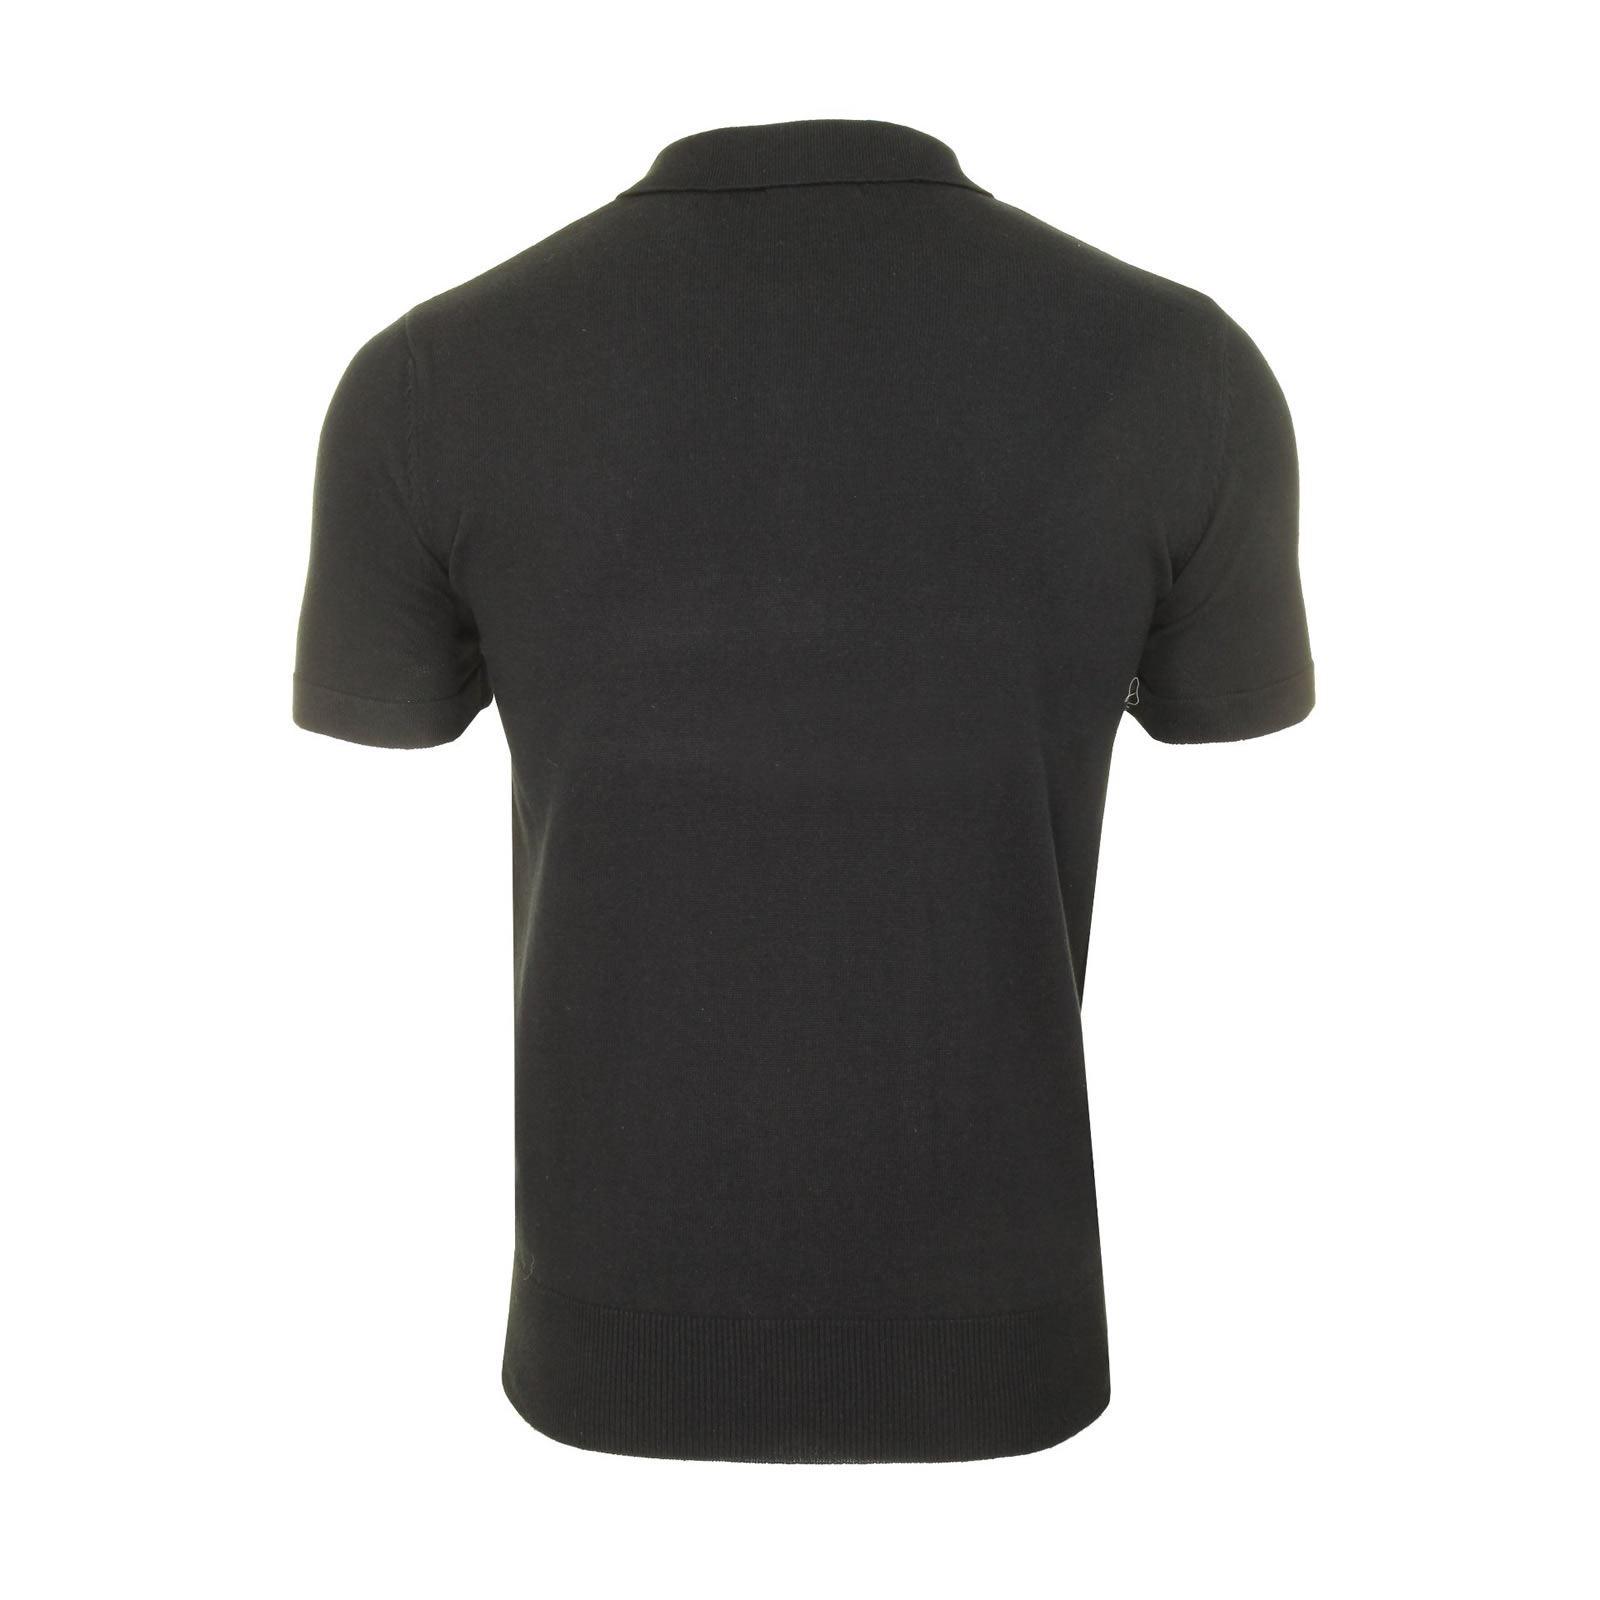 Mens-Knitted-Polo-Brave-Soul-Columbus-Collared-Short-Sleeve-Jumper-T-Shirt thumbnail 5